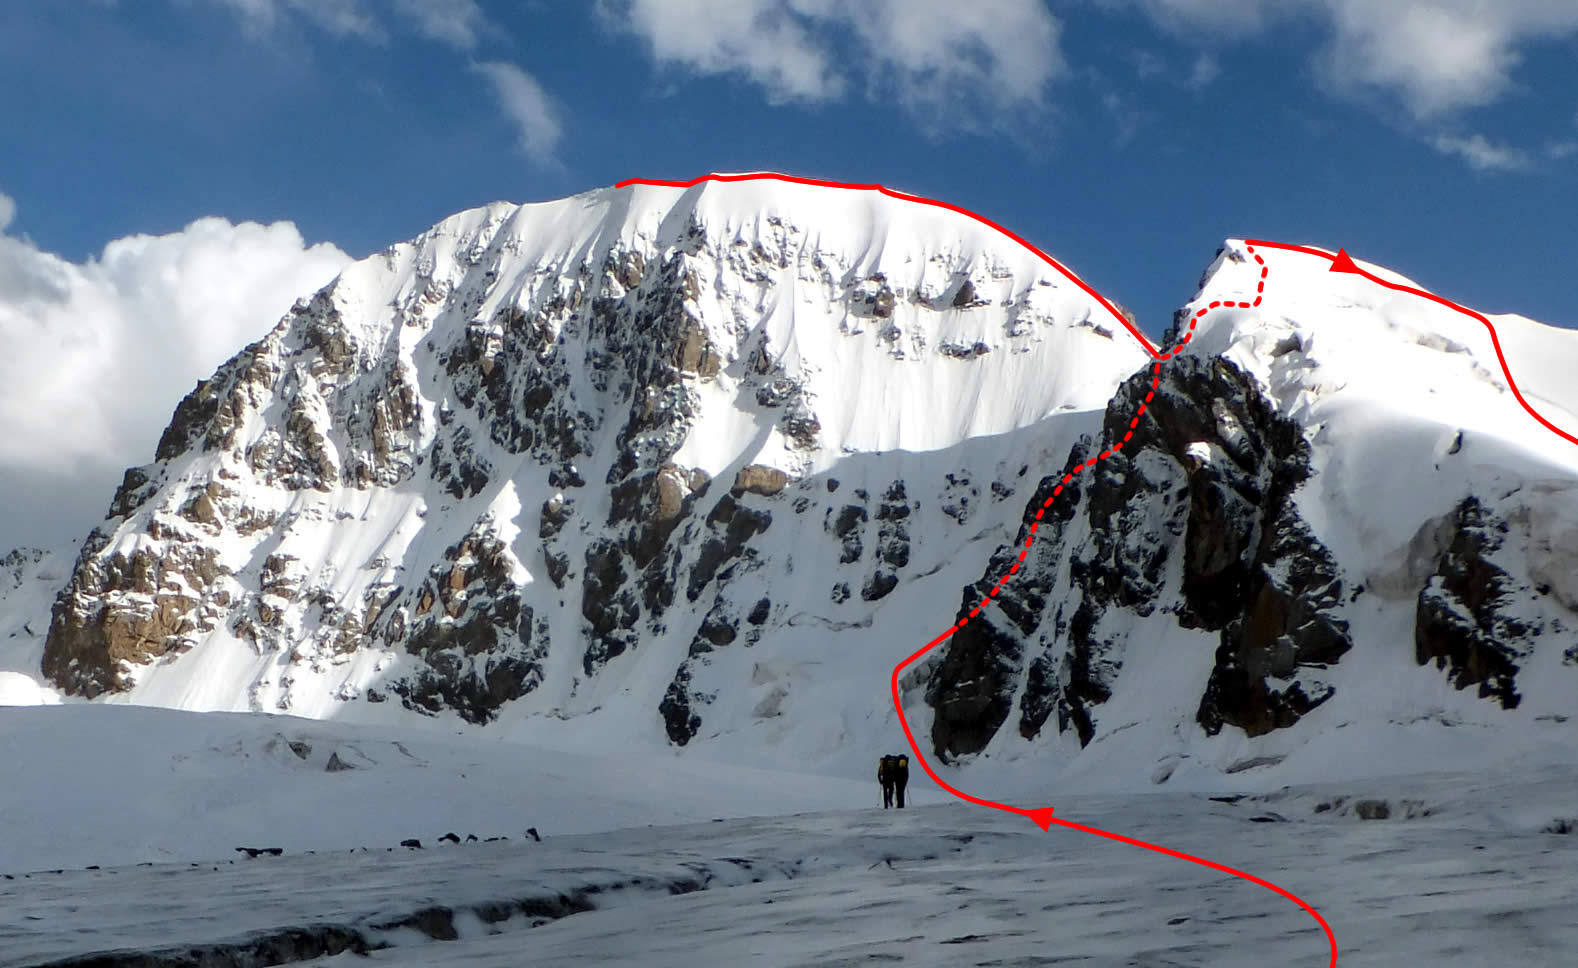 Peaks near the head of the Kichik Sauktor Glacier: (A) Peak Currahee, 5,025m, and (B) Peak Little, ca 4,850m. (1) Route to col where team split to climb each peak. (2) Descent from Peak Little.